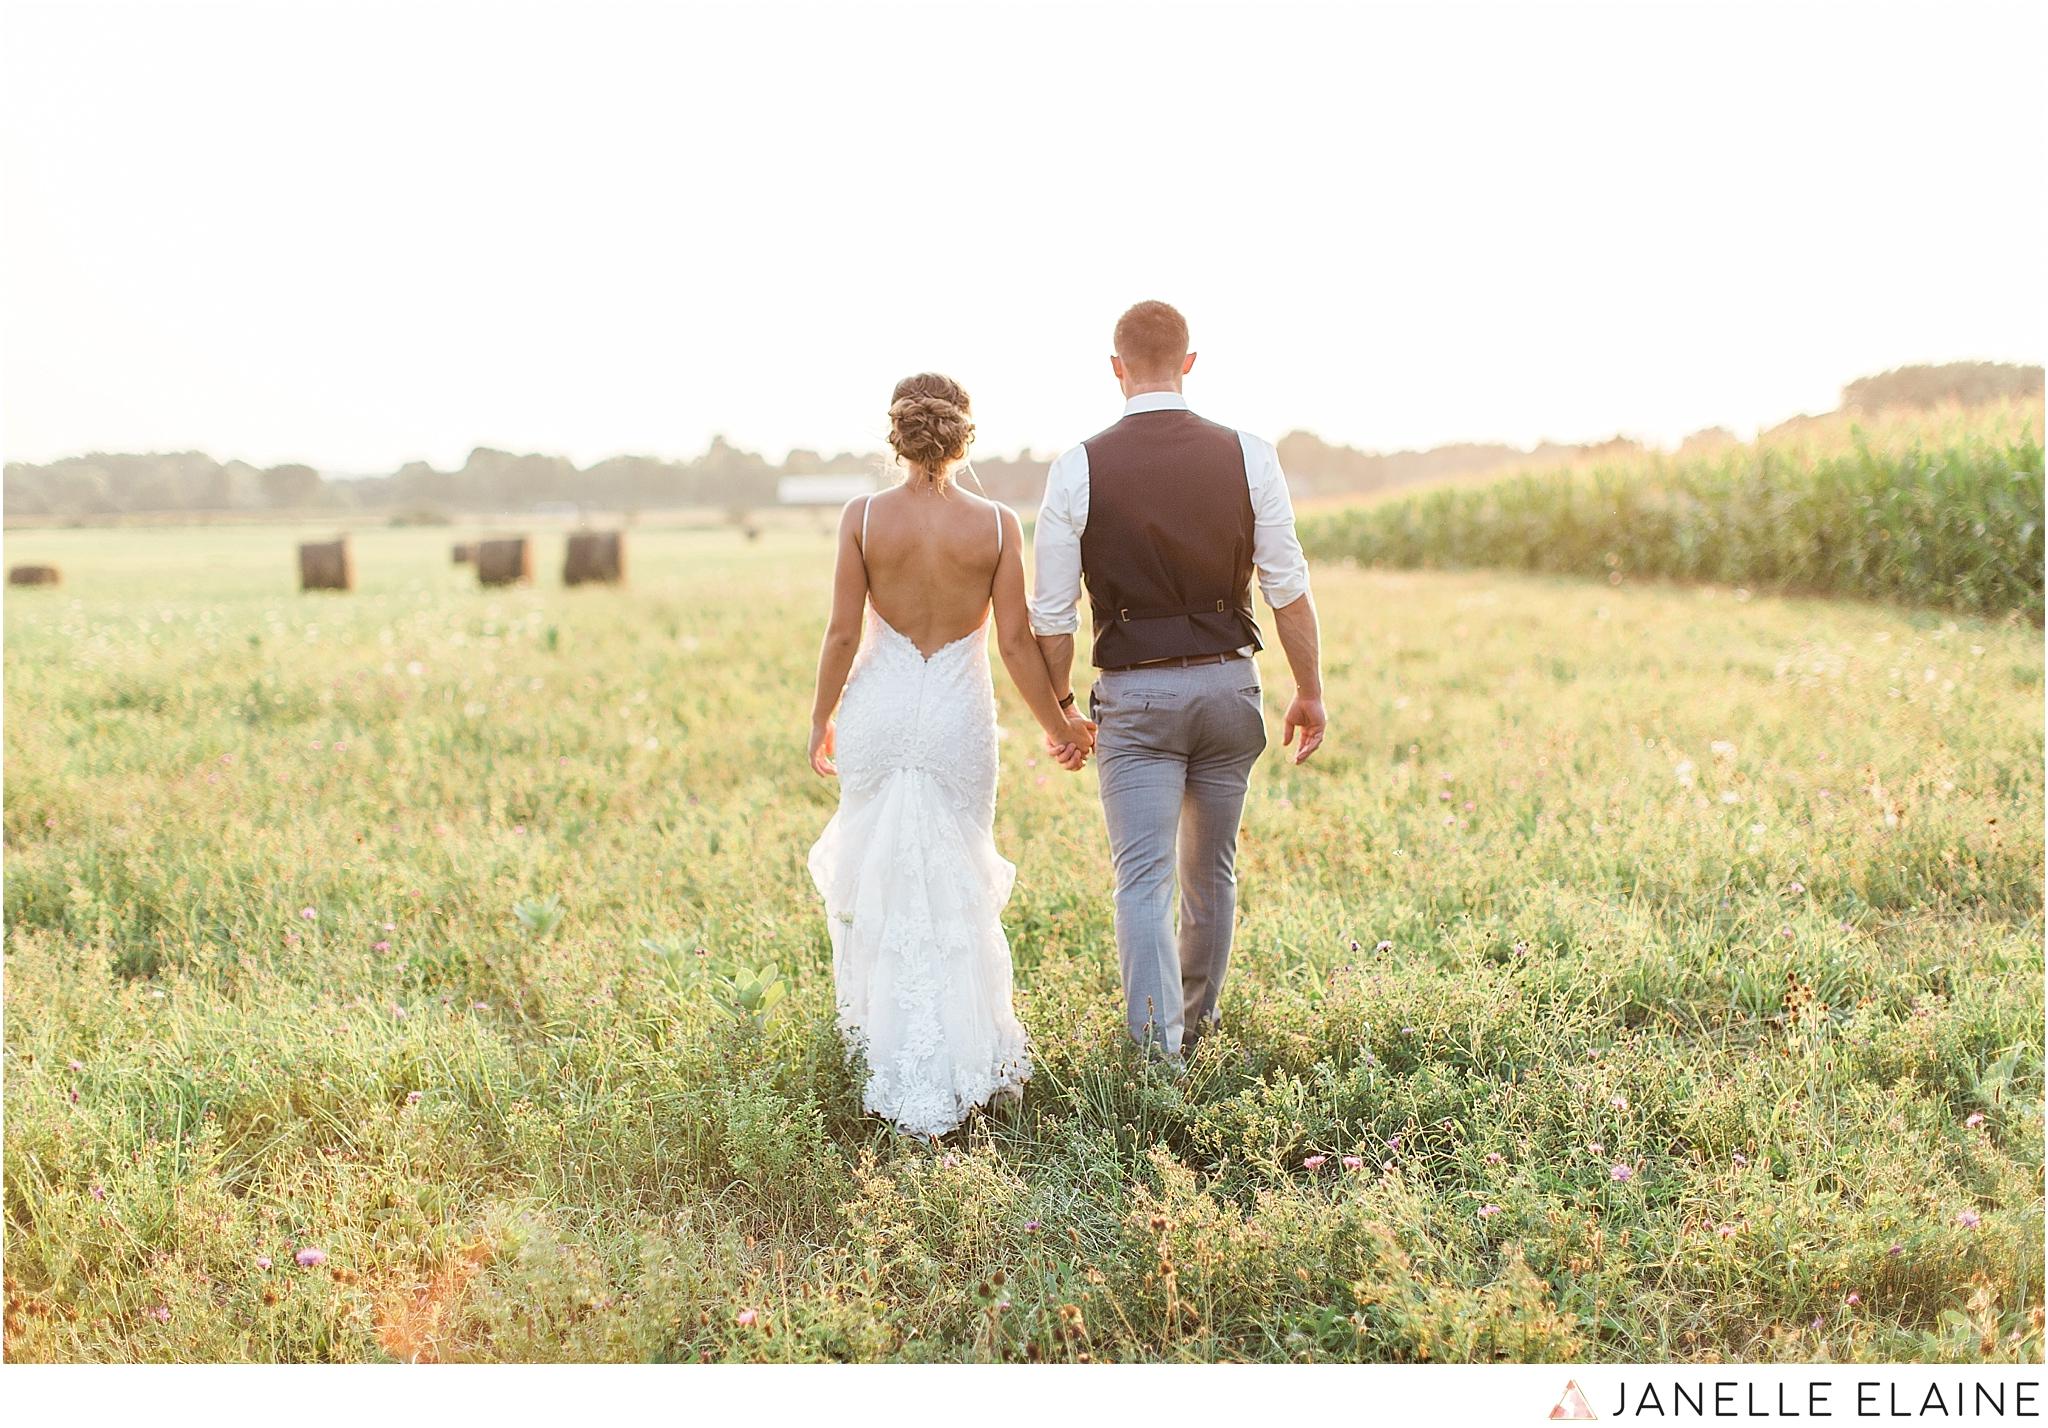 warnsholz-wedding-michigan-photography-janelle elaine photography-211.jpg